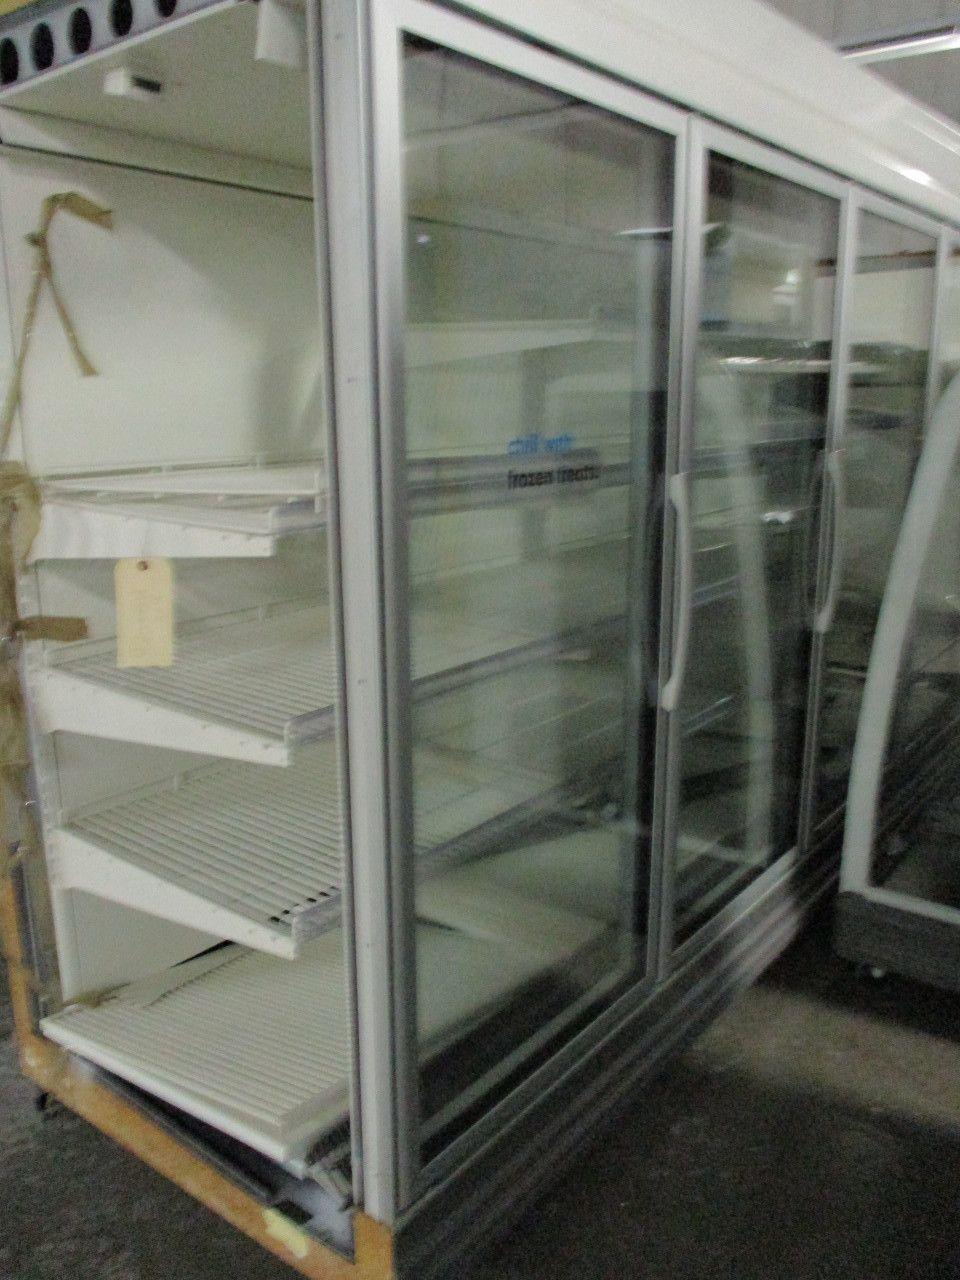 AHT Vento Freeze 3125 4-türiger Gefrierschrank (TEILE)